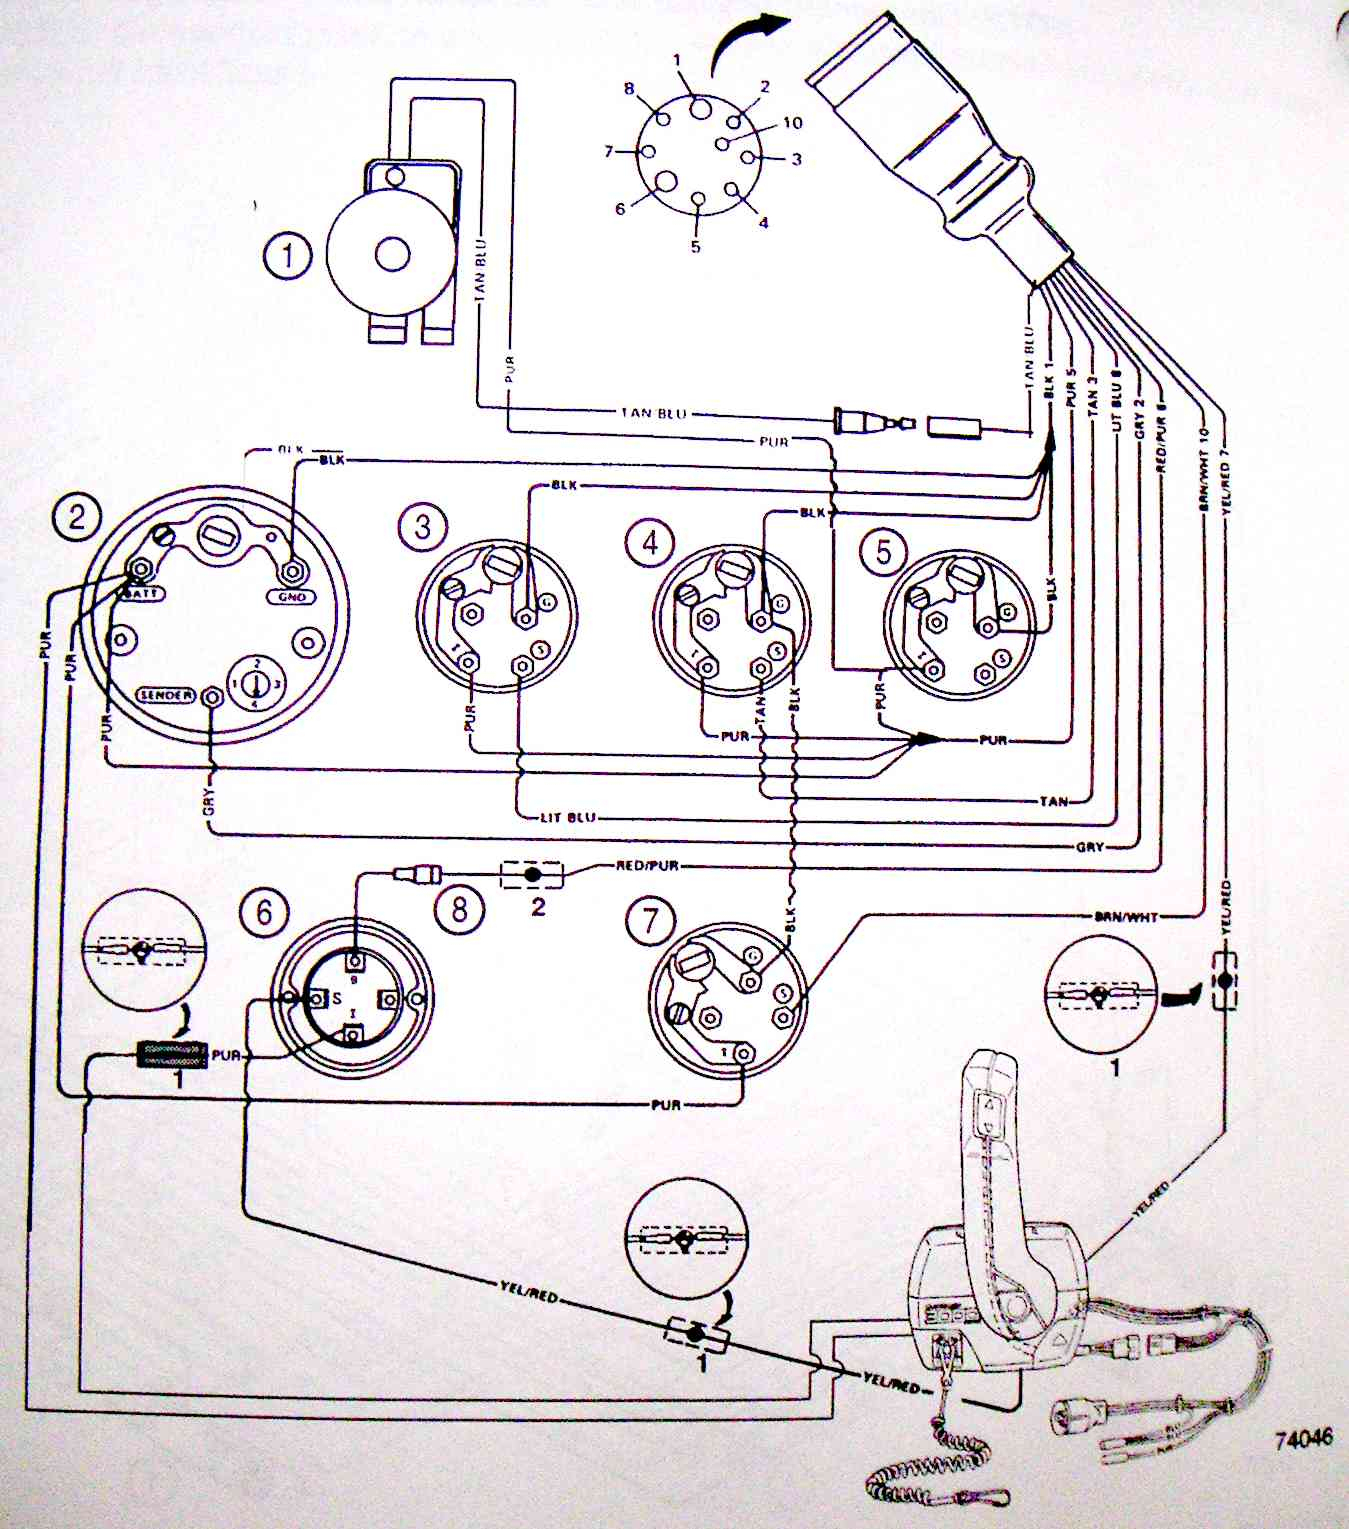 Mercruiser Tilt Trim Gauge Wiring Diagram | Wiring Diagram - Mercruiser Trim Sender Wiring Diagram